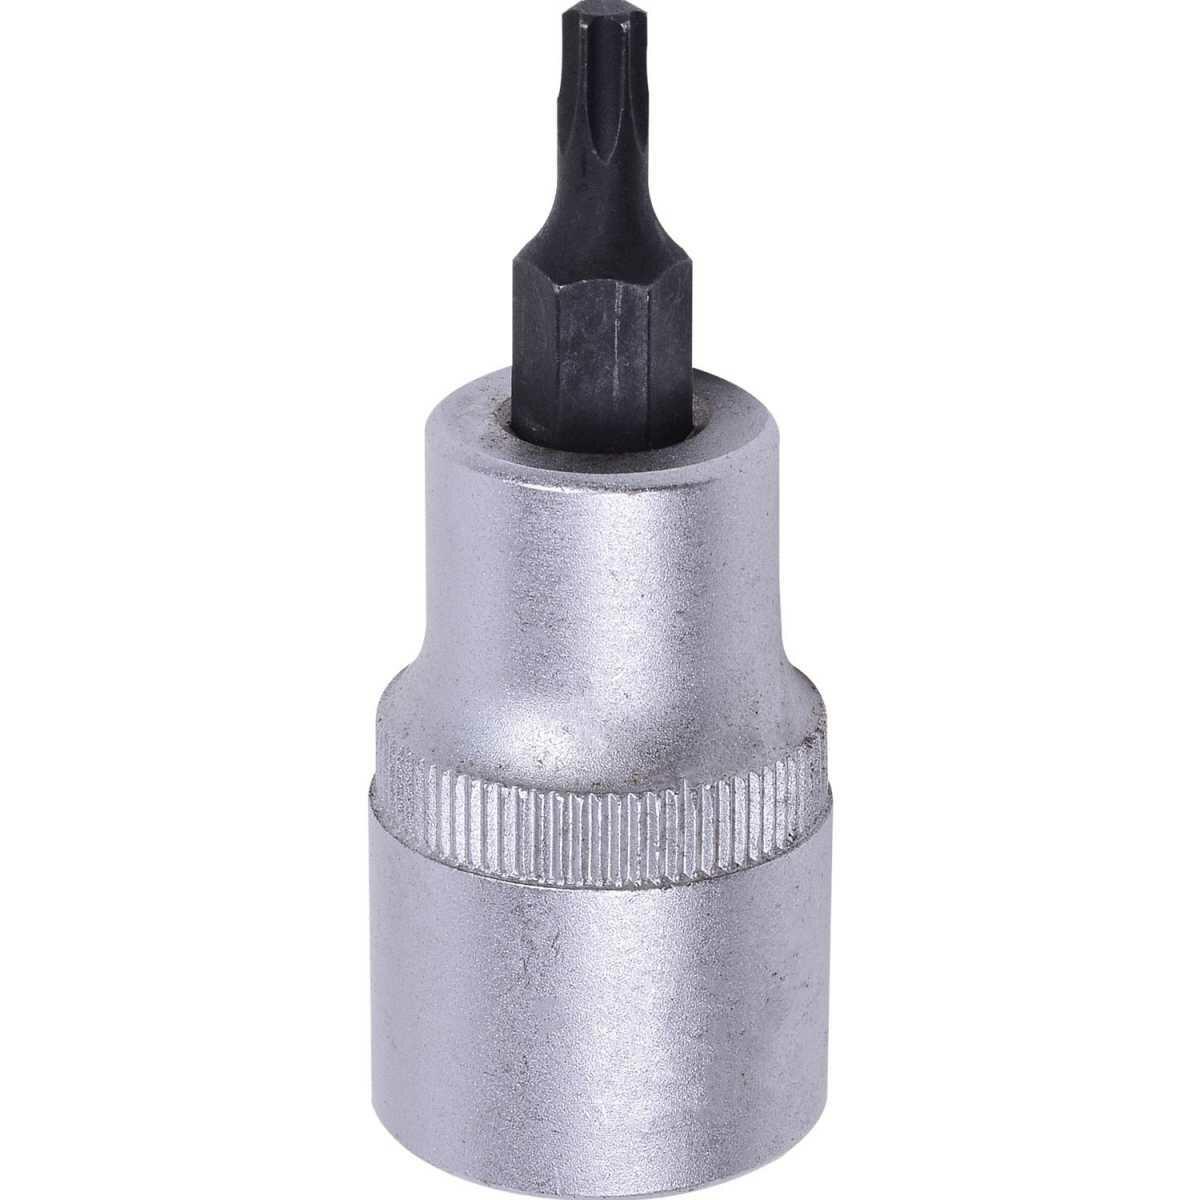 Soquete Hexalobular T 25 Macho Enc. 3/8 060978 Robust